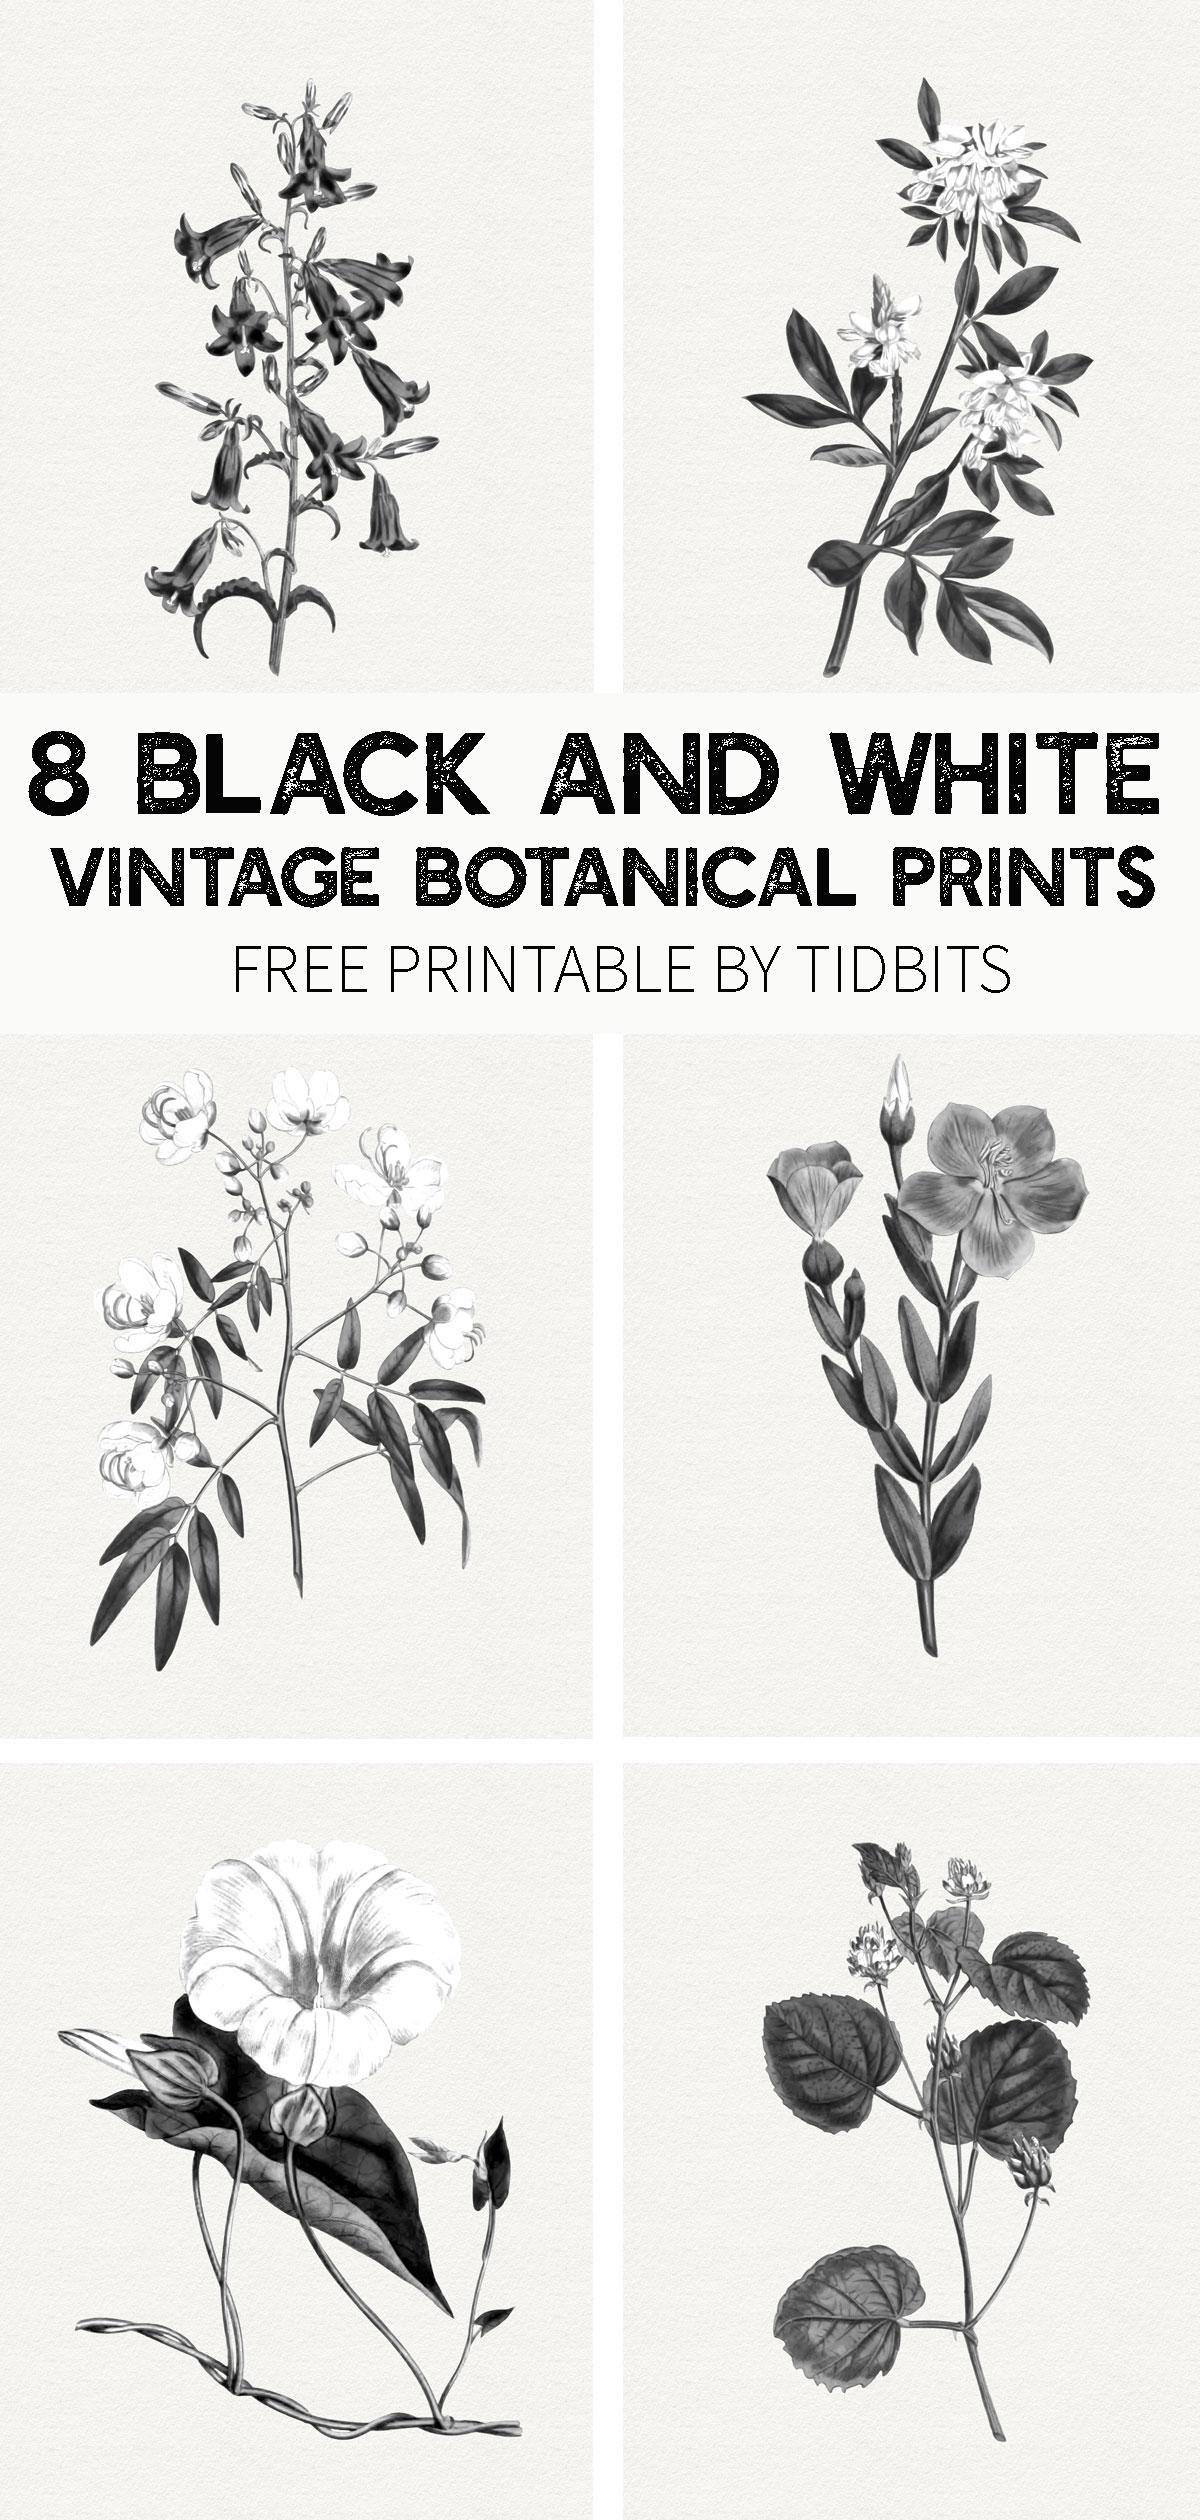 Free black and white vintage botanical prints